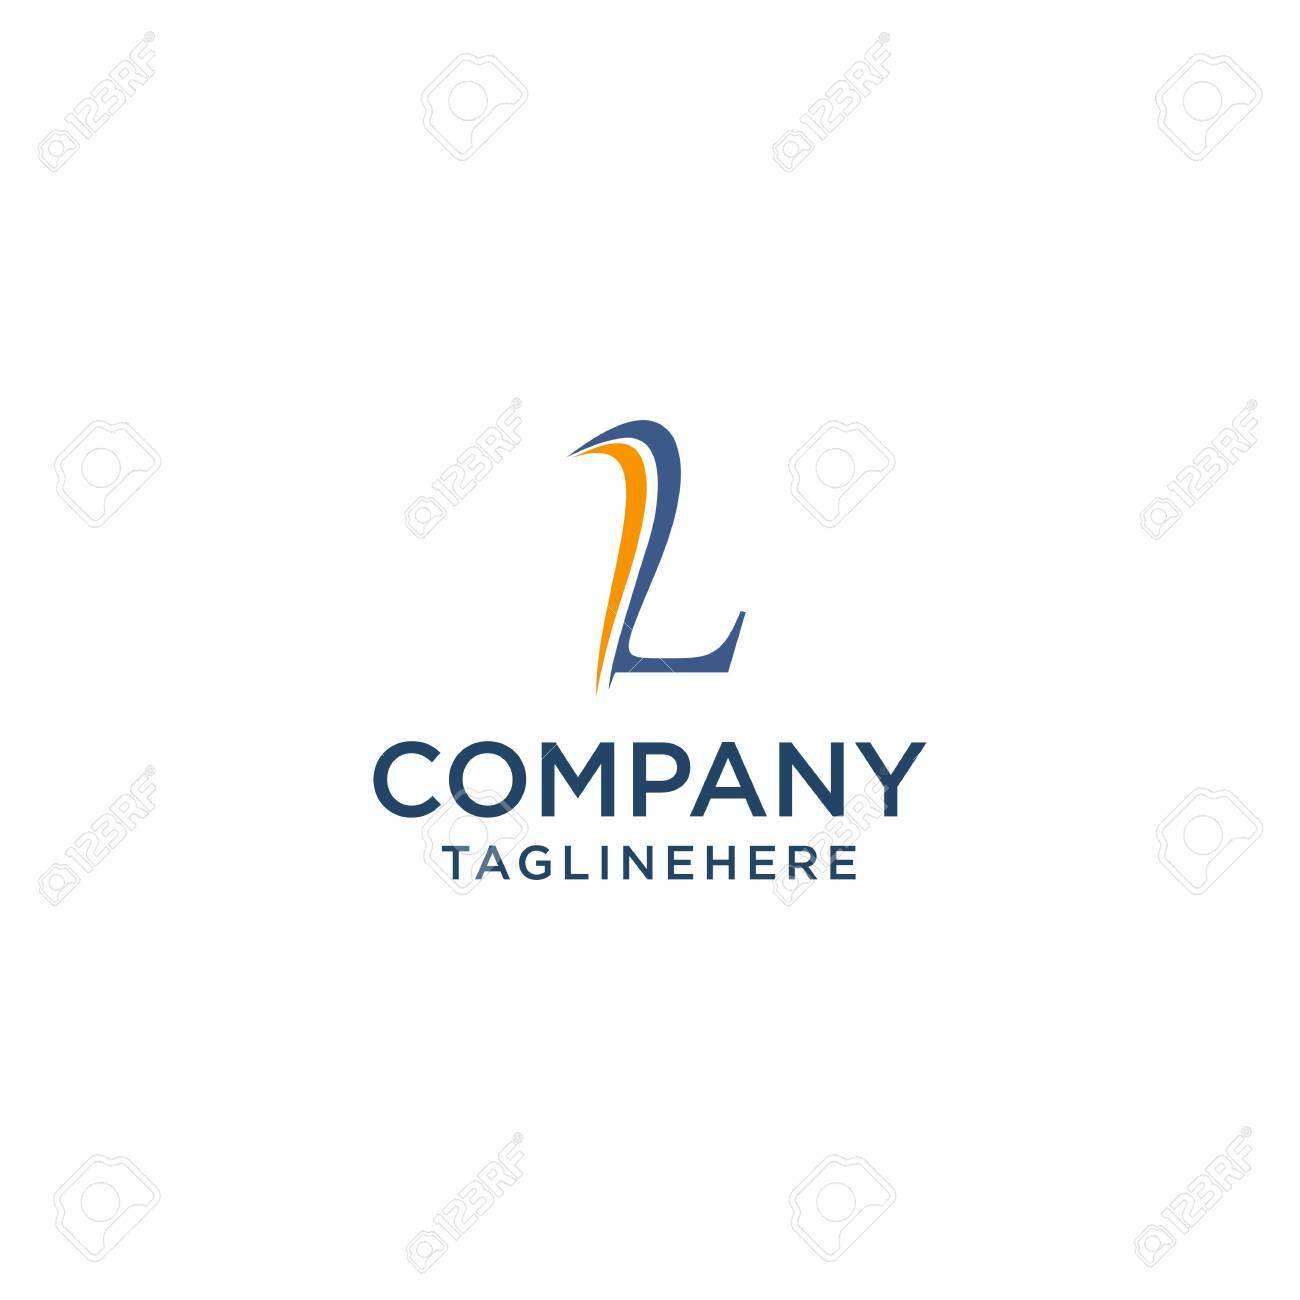 letter L luxury swoosh corporate logo design concept template - 129613619